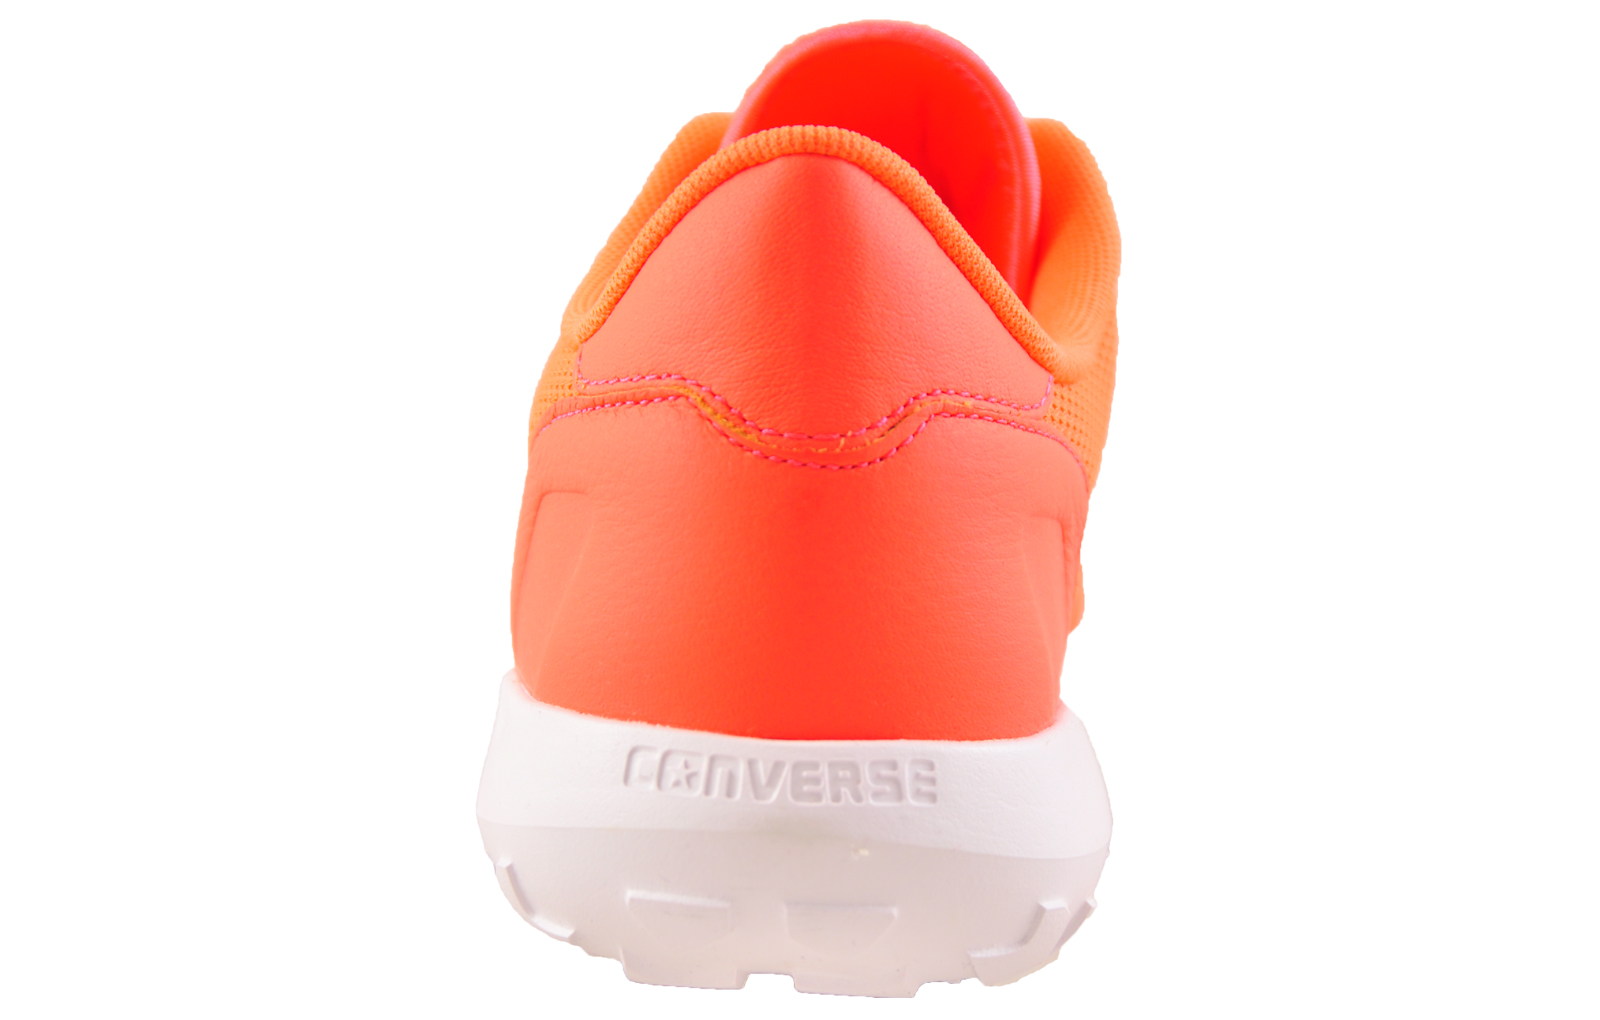 0b7a6dff54 Hyper Orange / Black / White. Converse Thunderbolt Ultra Ox Uni - CN183871.  alternate view 1. alternate view 2. alternate view 1